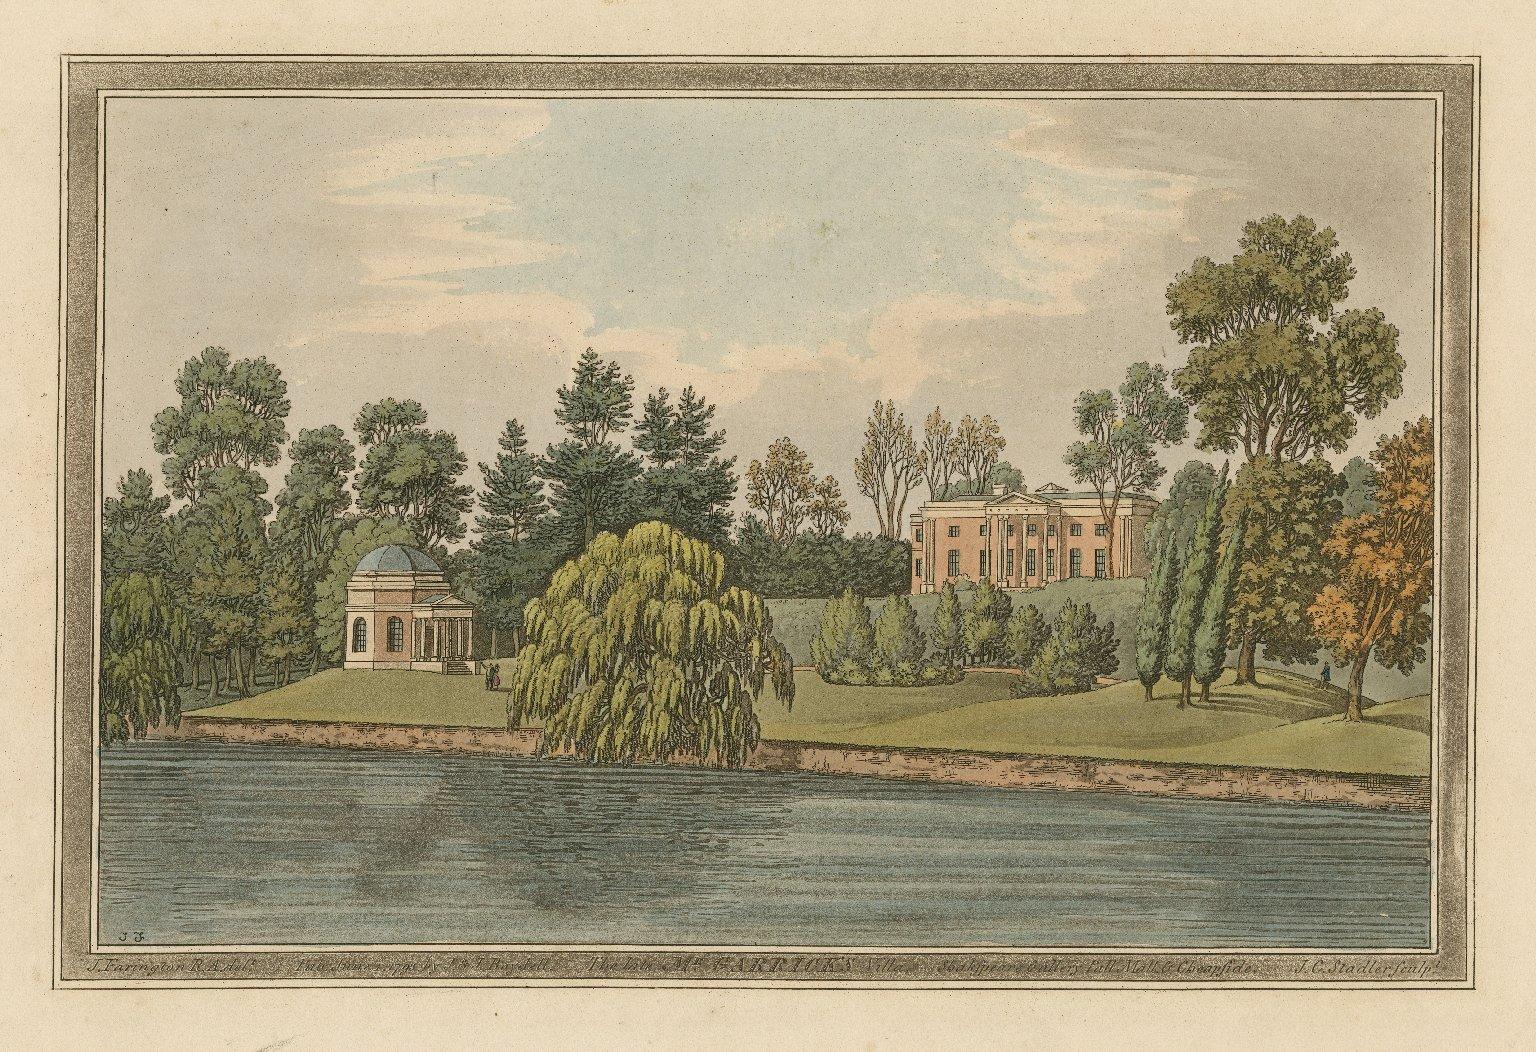 The late Mr. Garrick's villa [graphic] / J. Farington R.A. delt. ; J.C. Stadler sculpt.